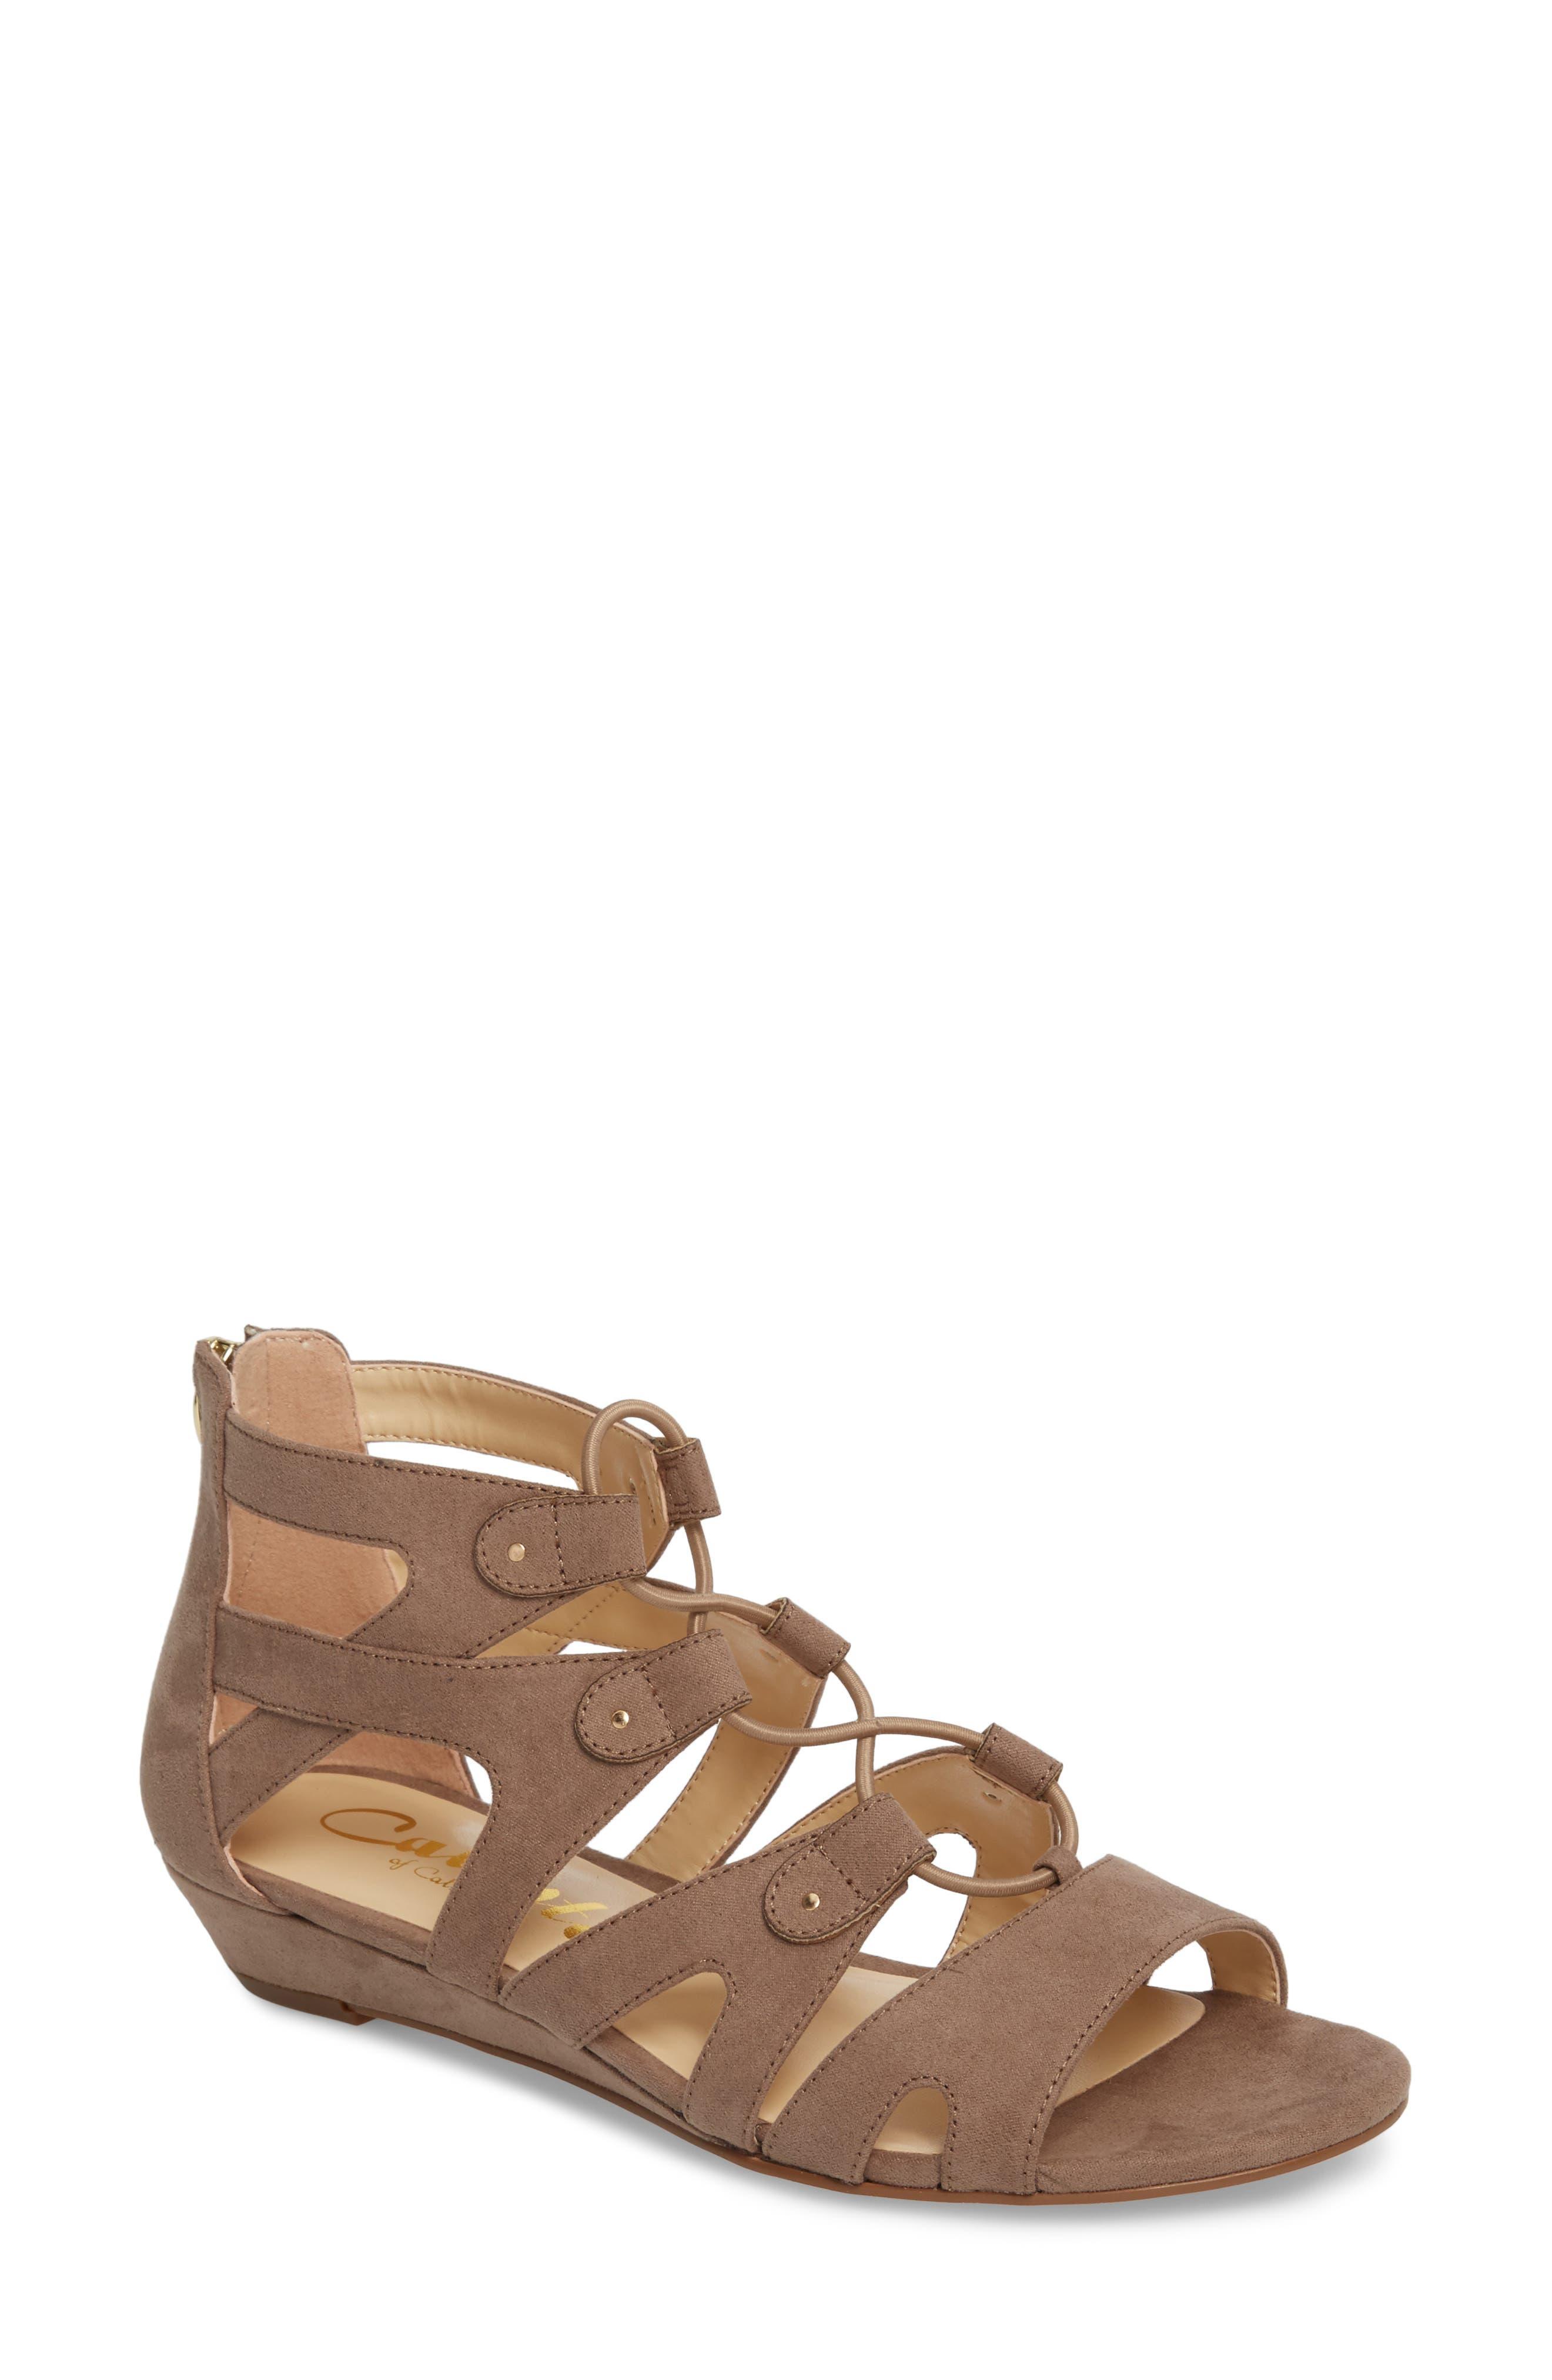 Lexx Lace-Up Sandal,                         Main,                         color, Taupe Suede